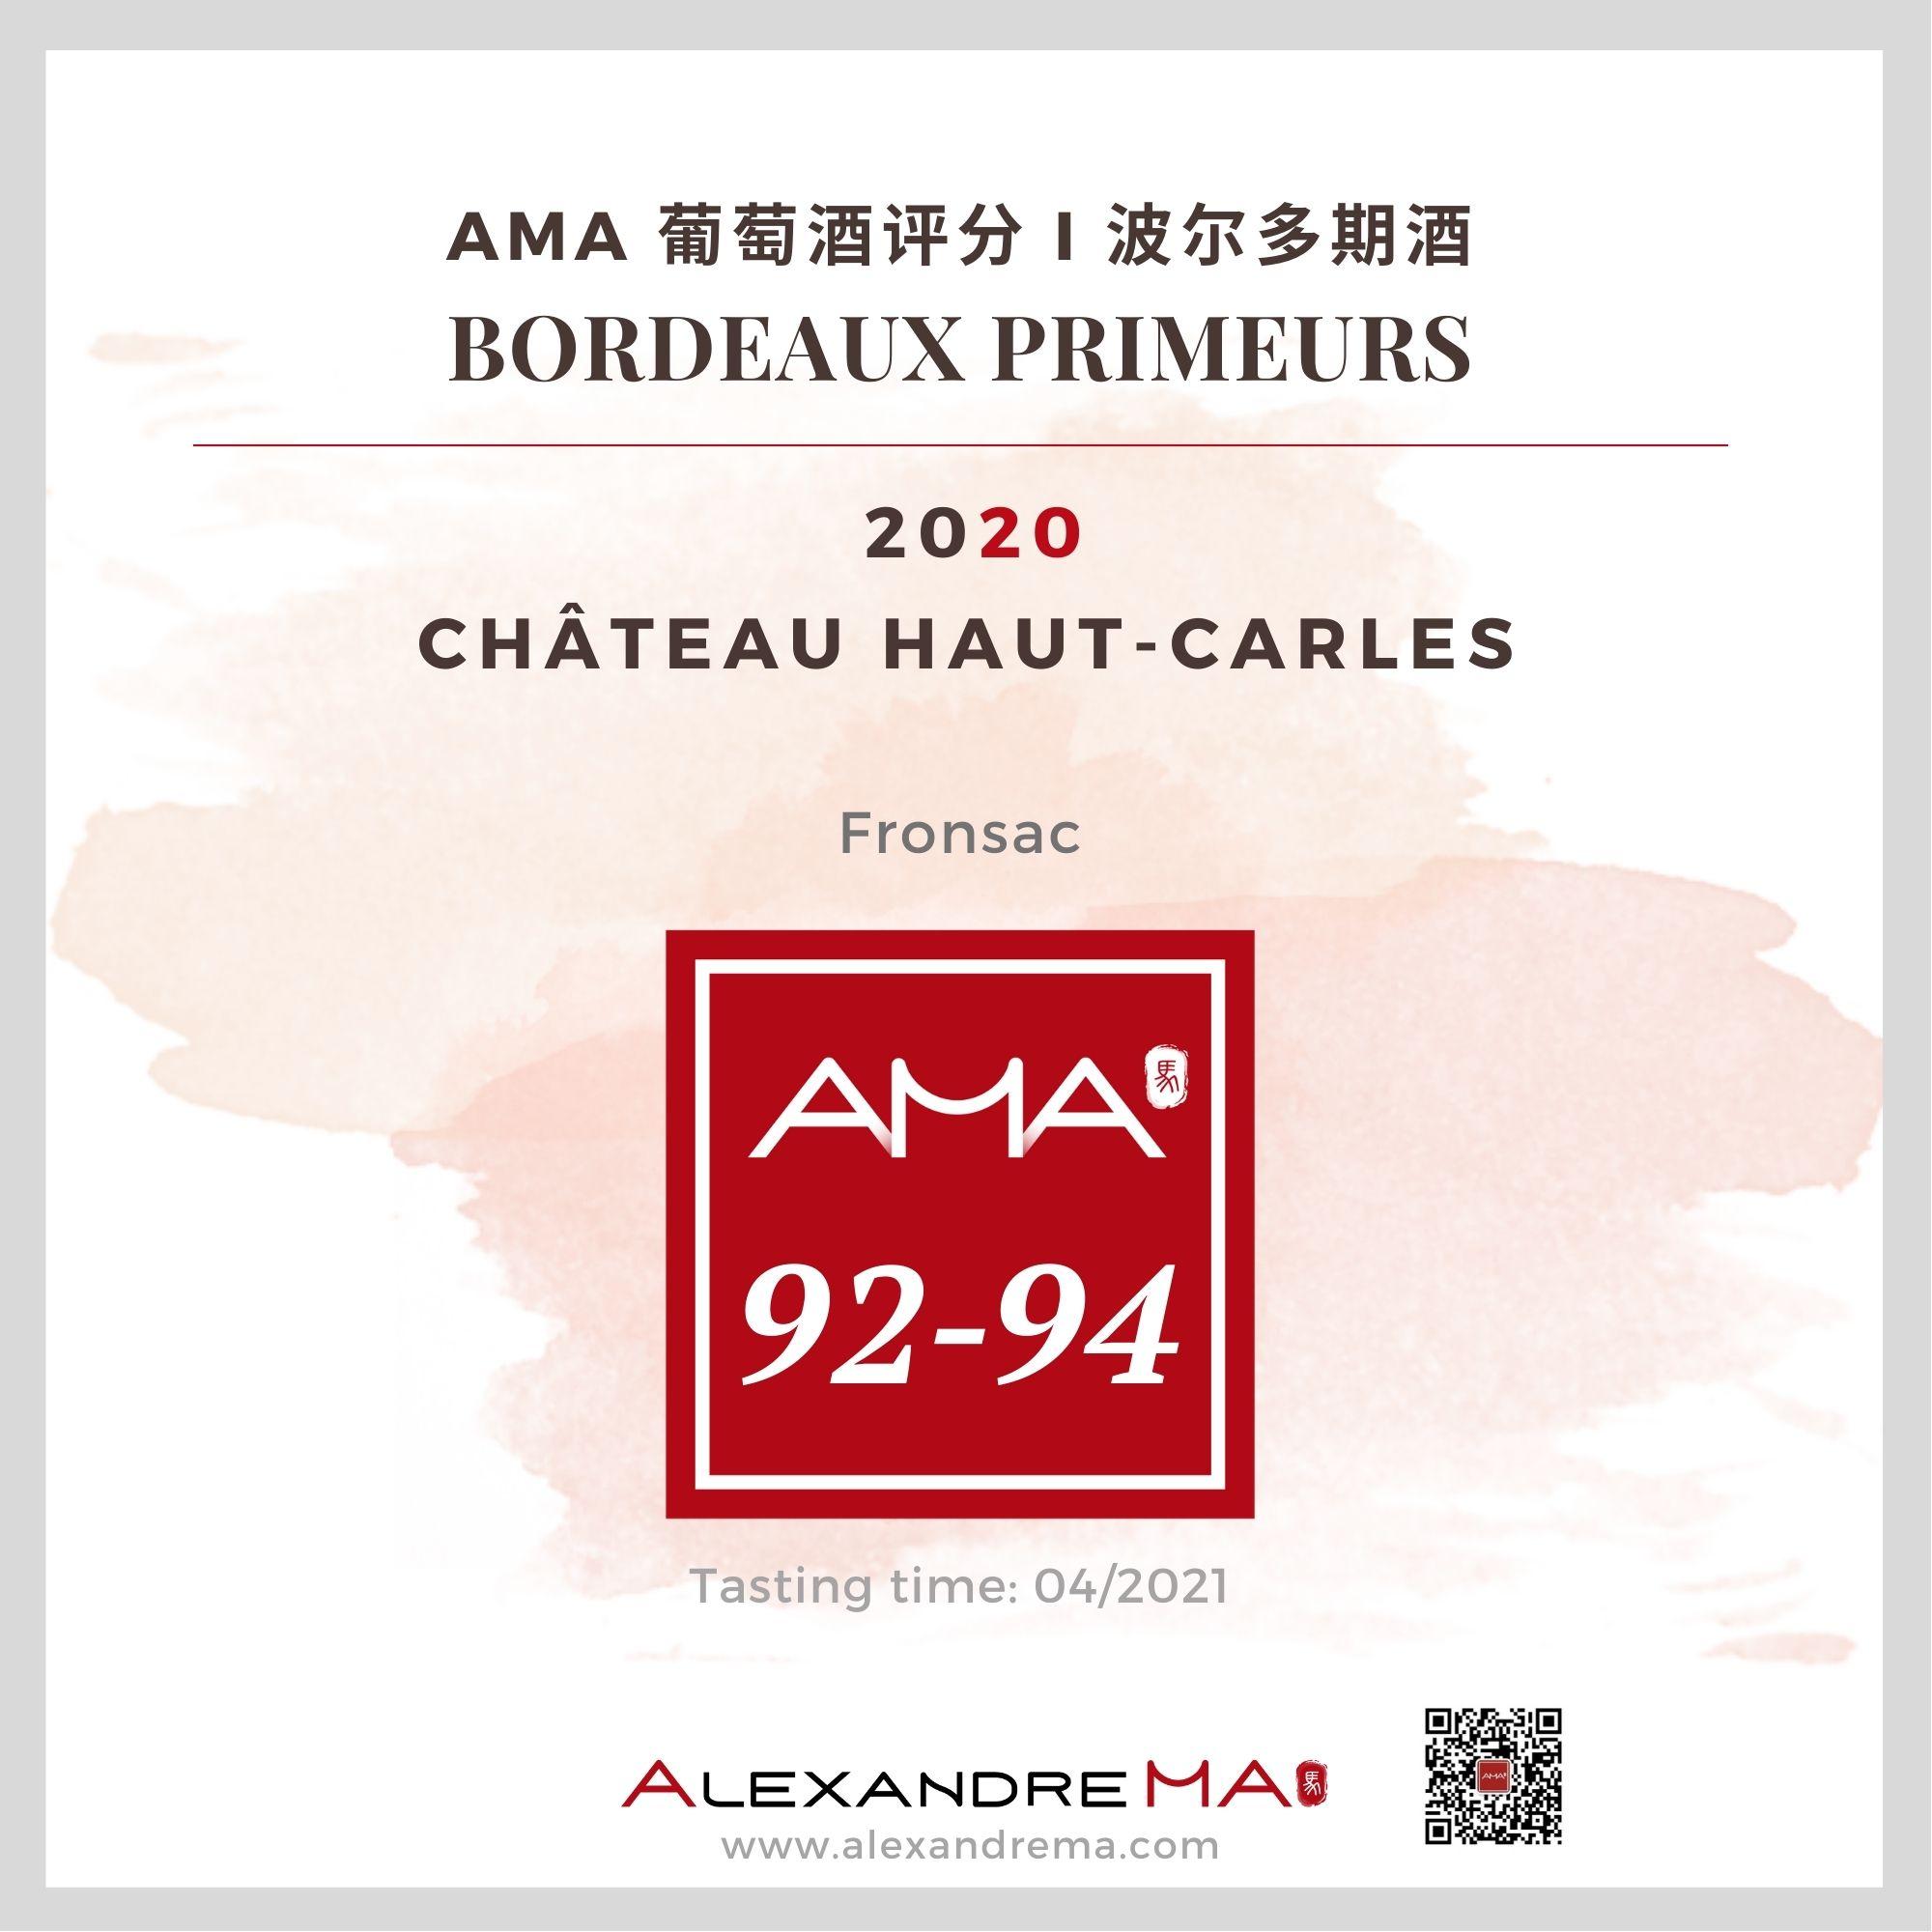 Château Haut-Carles 2020 - Alexandre MA